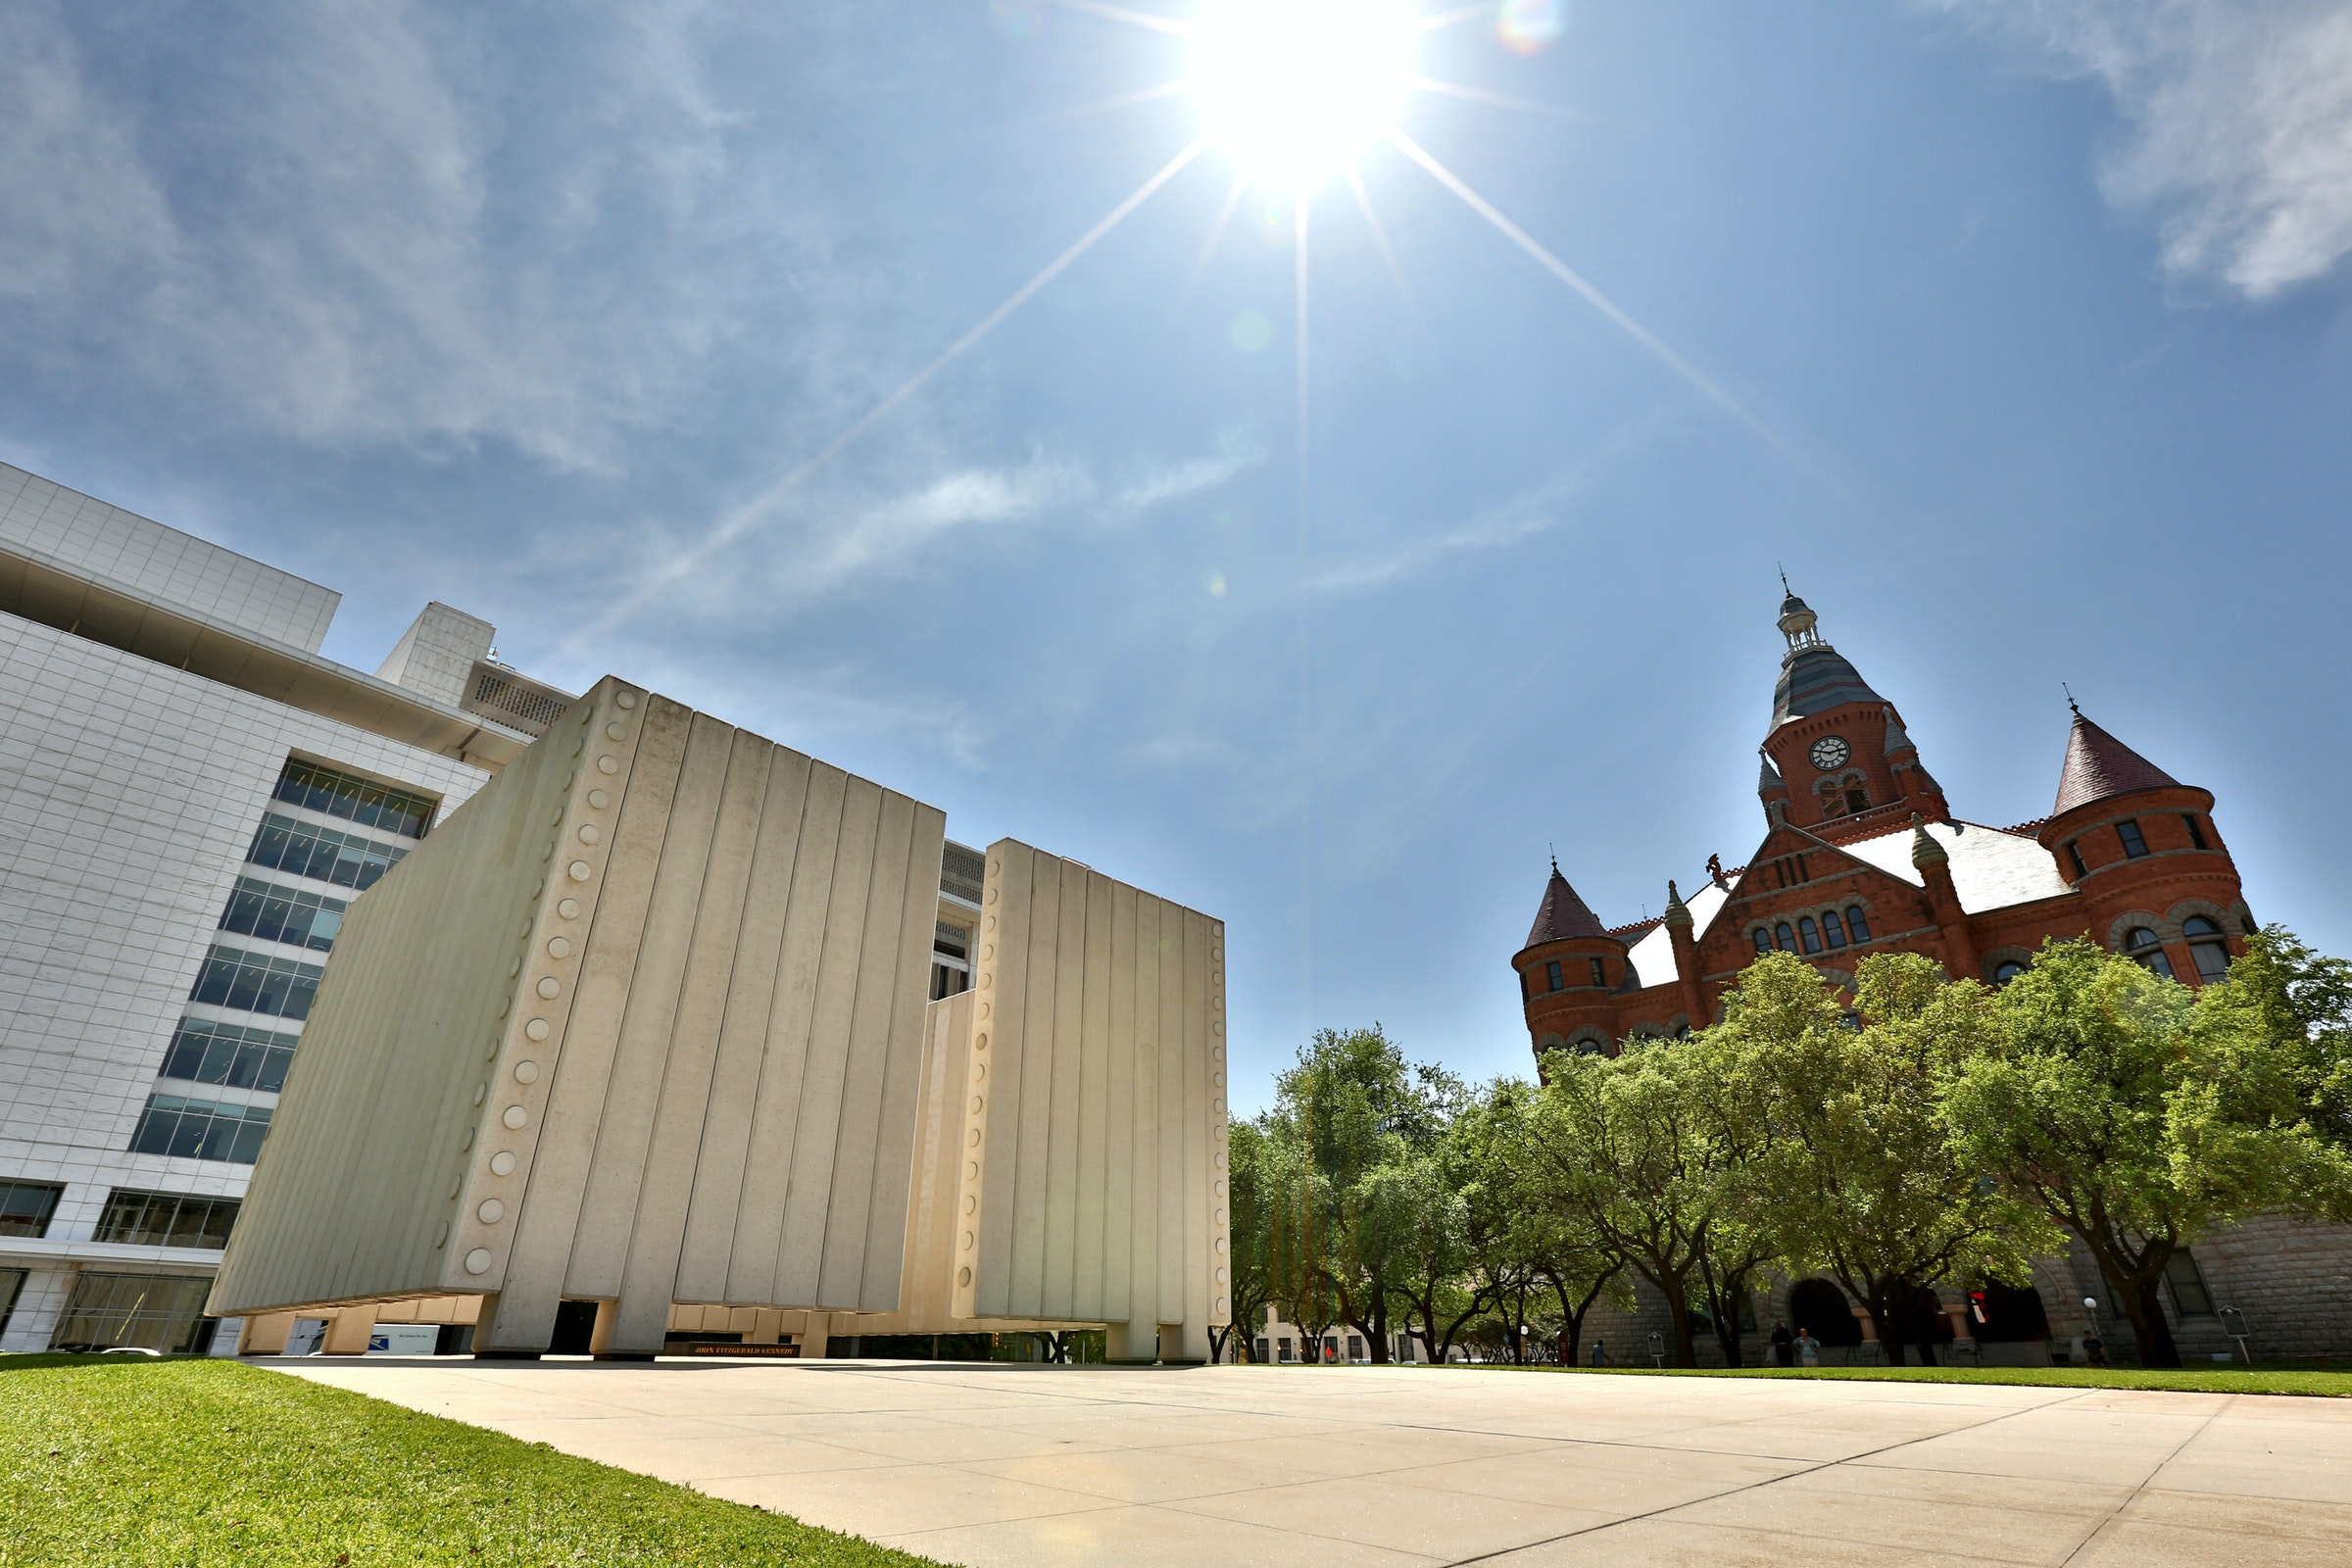 John F. Kennedy Memorial in Beyond Dallas